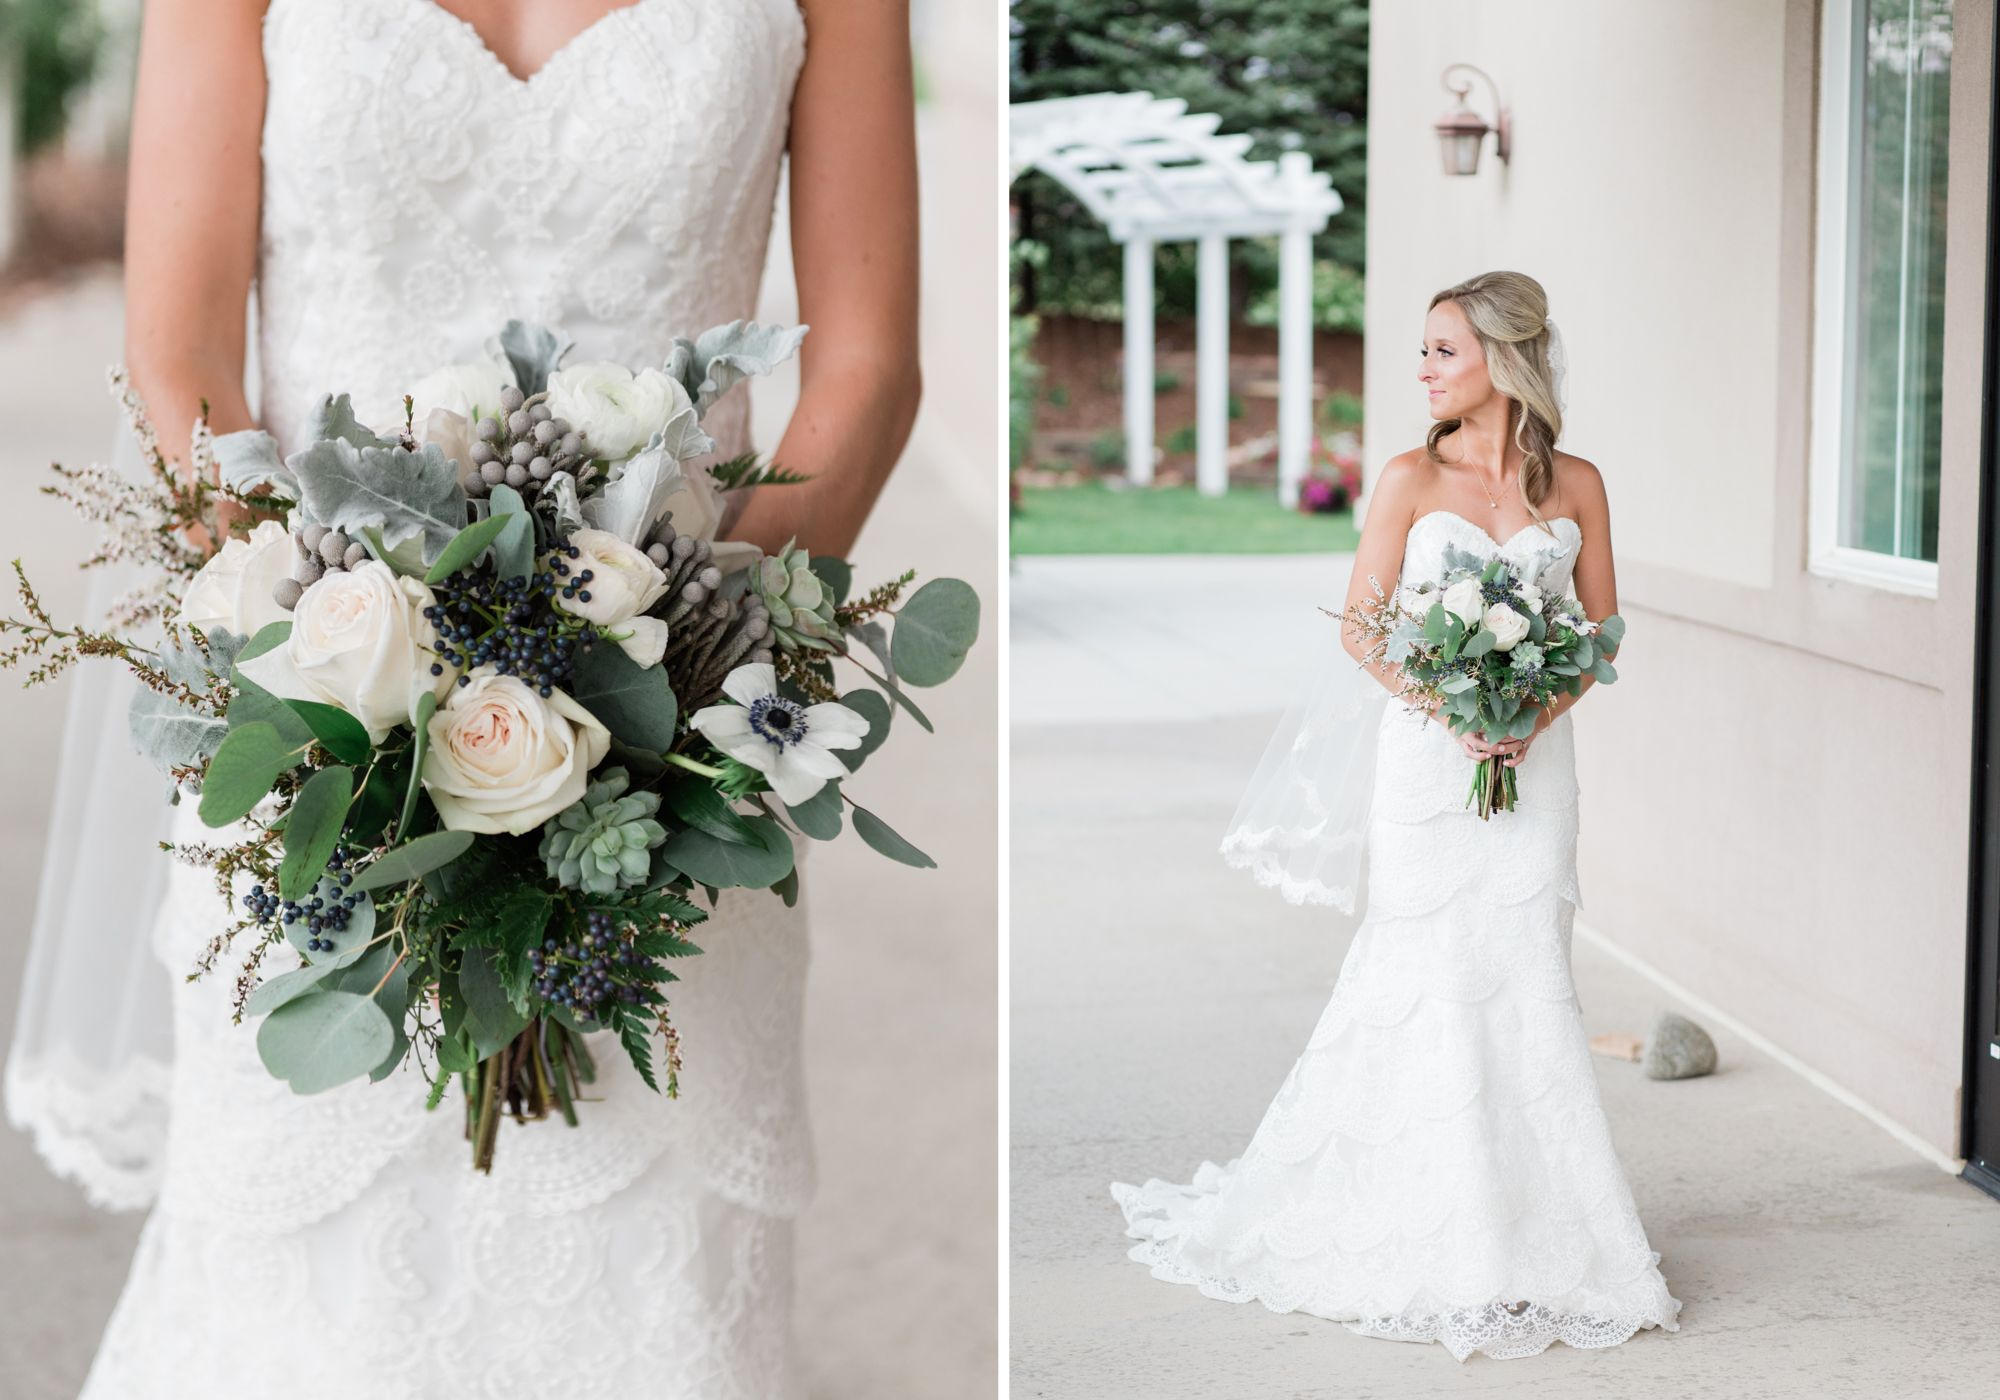 Fiori Wedding.Venue Wedgewood Weddings Ken Caryl Bridal Attire Moonlight